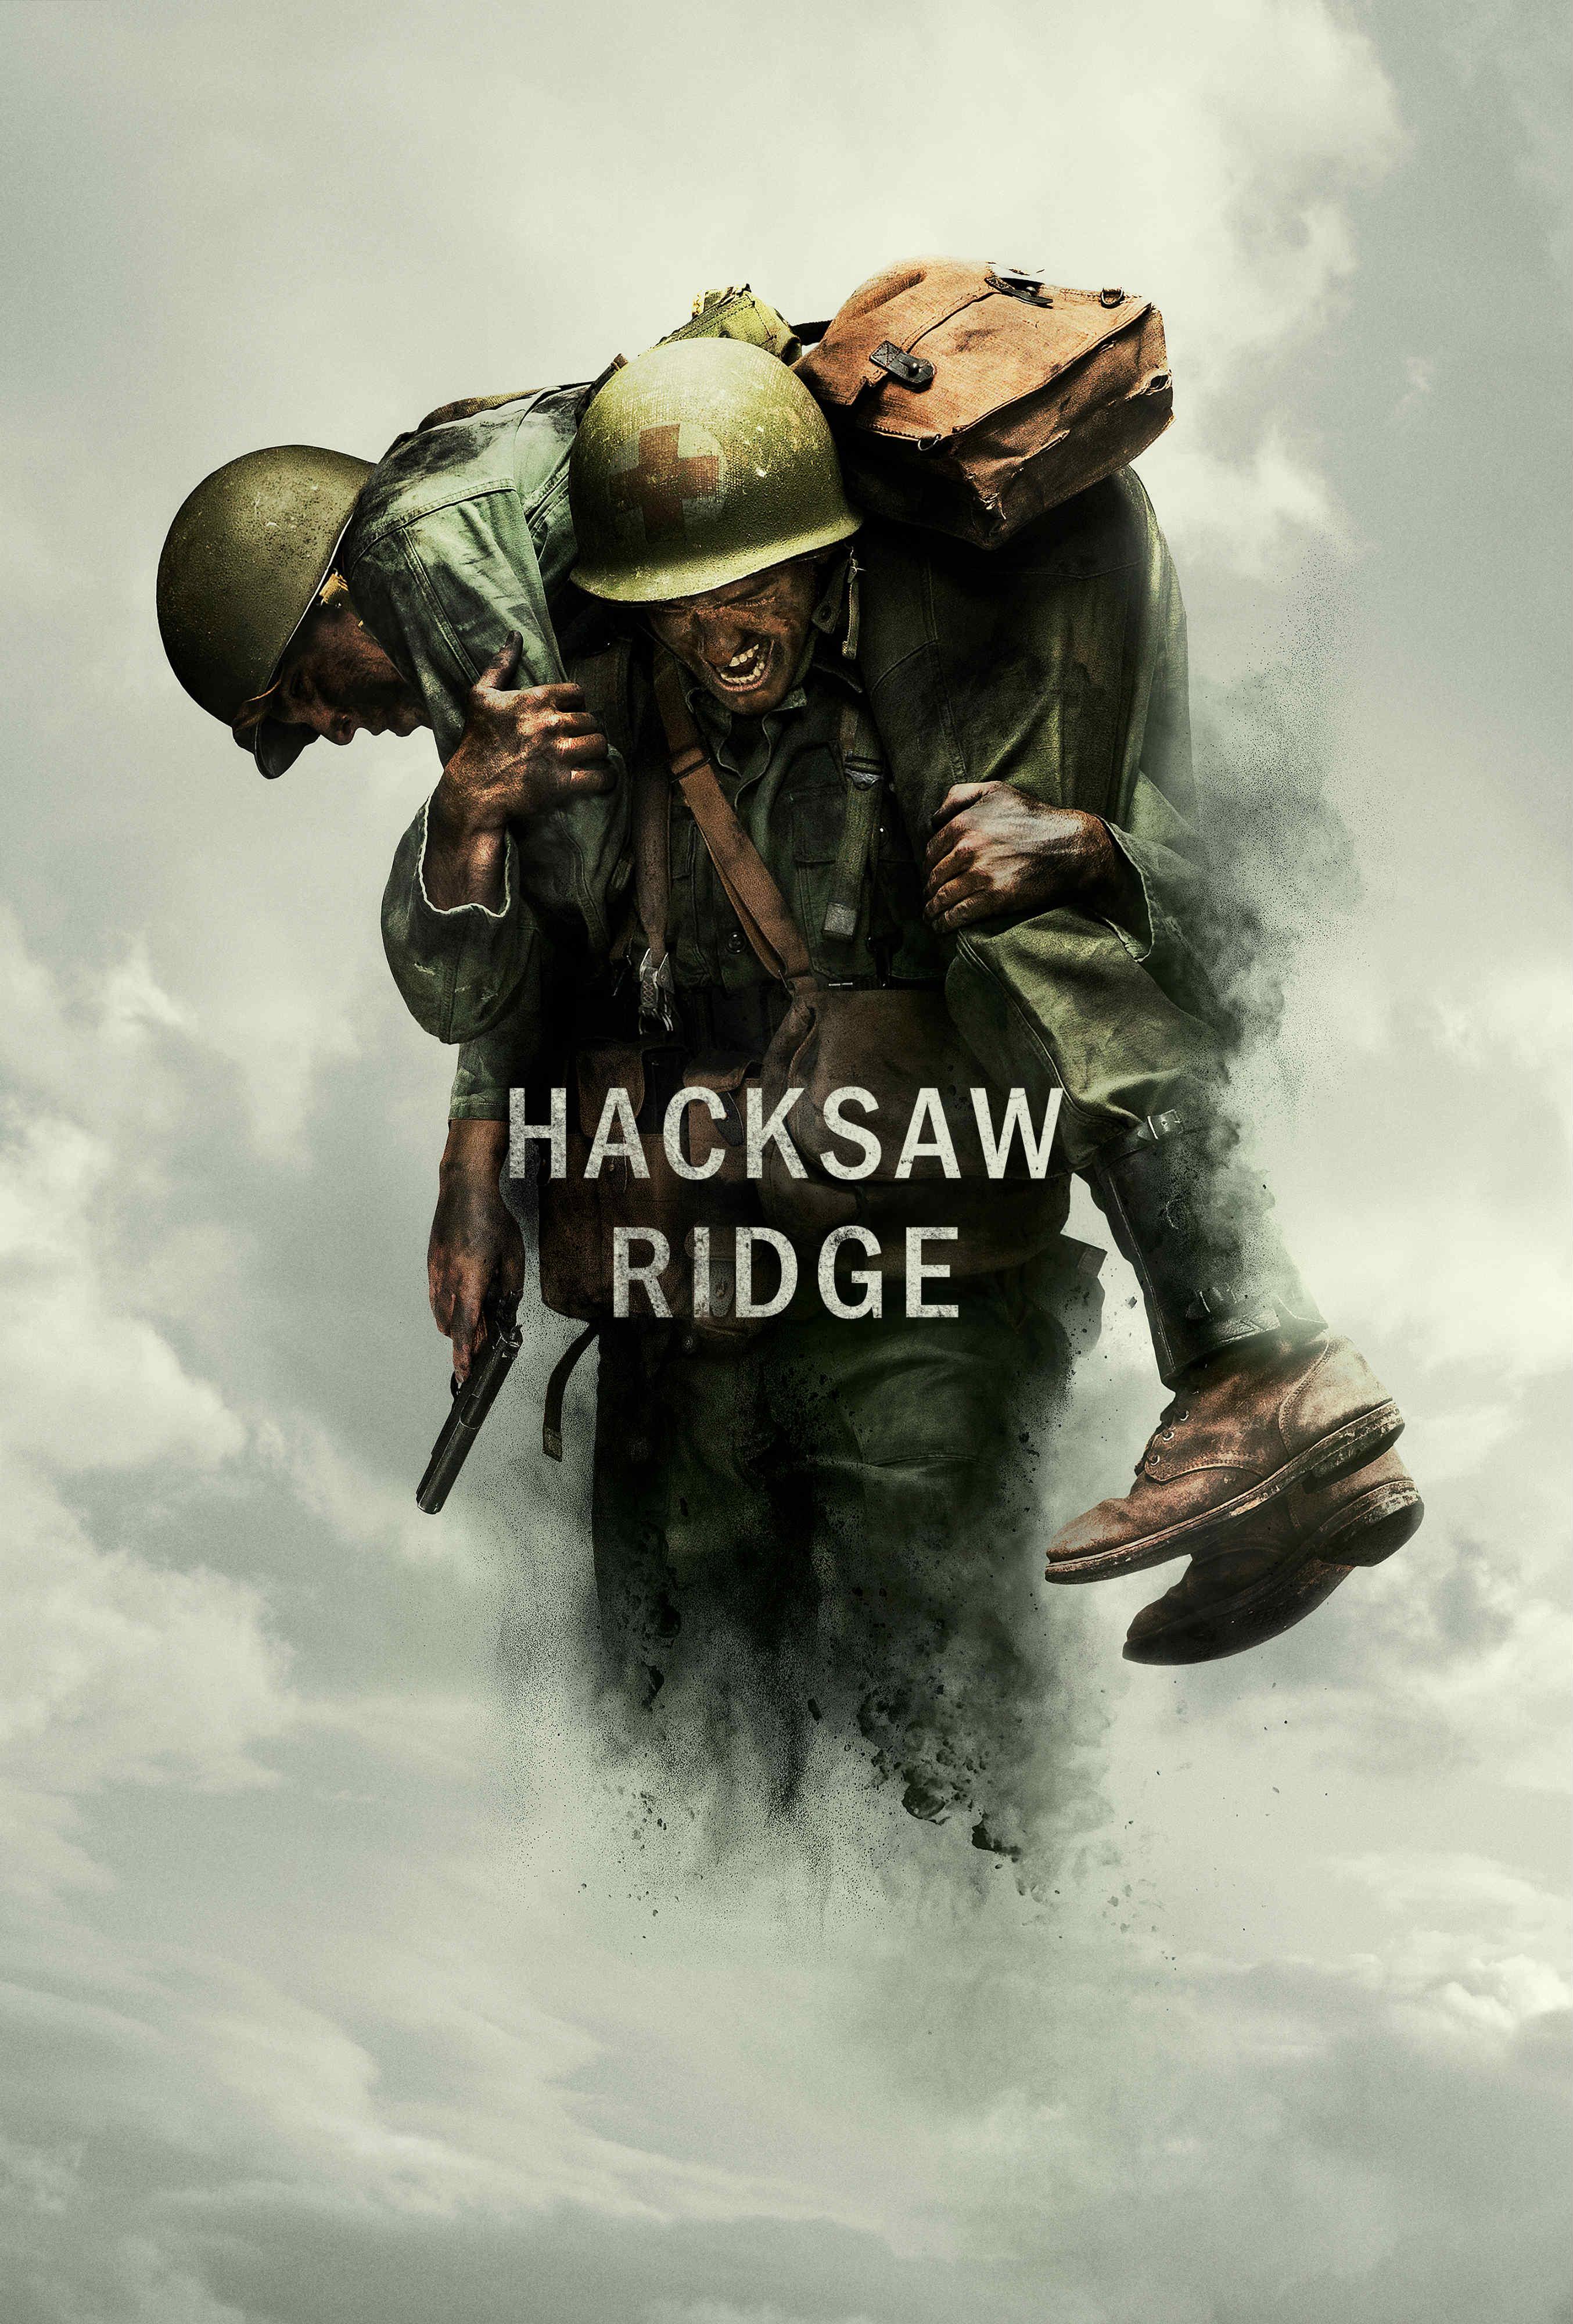 HacksawRidge